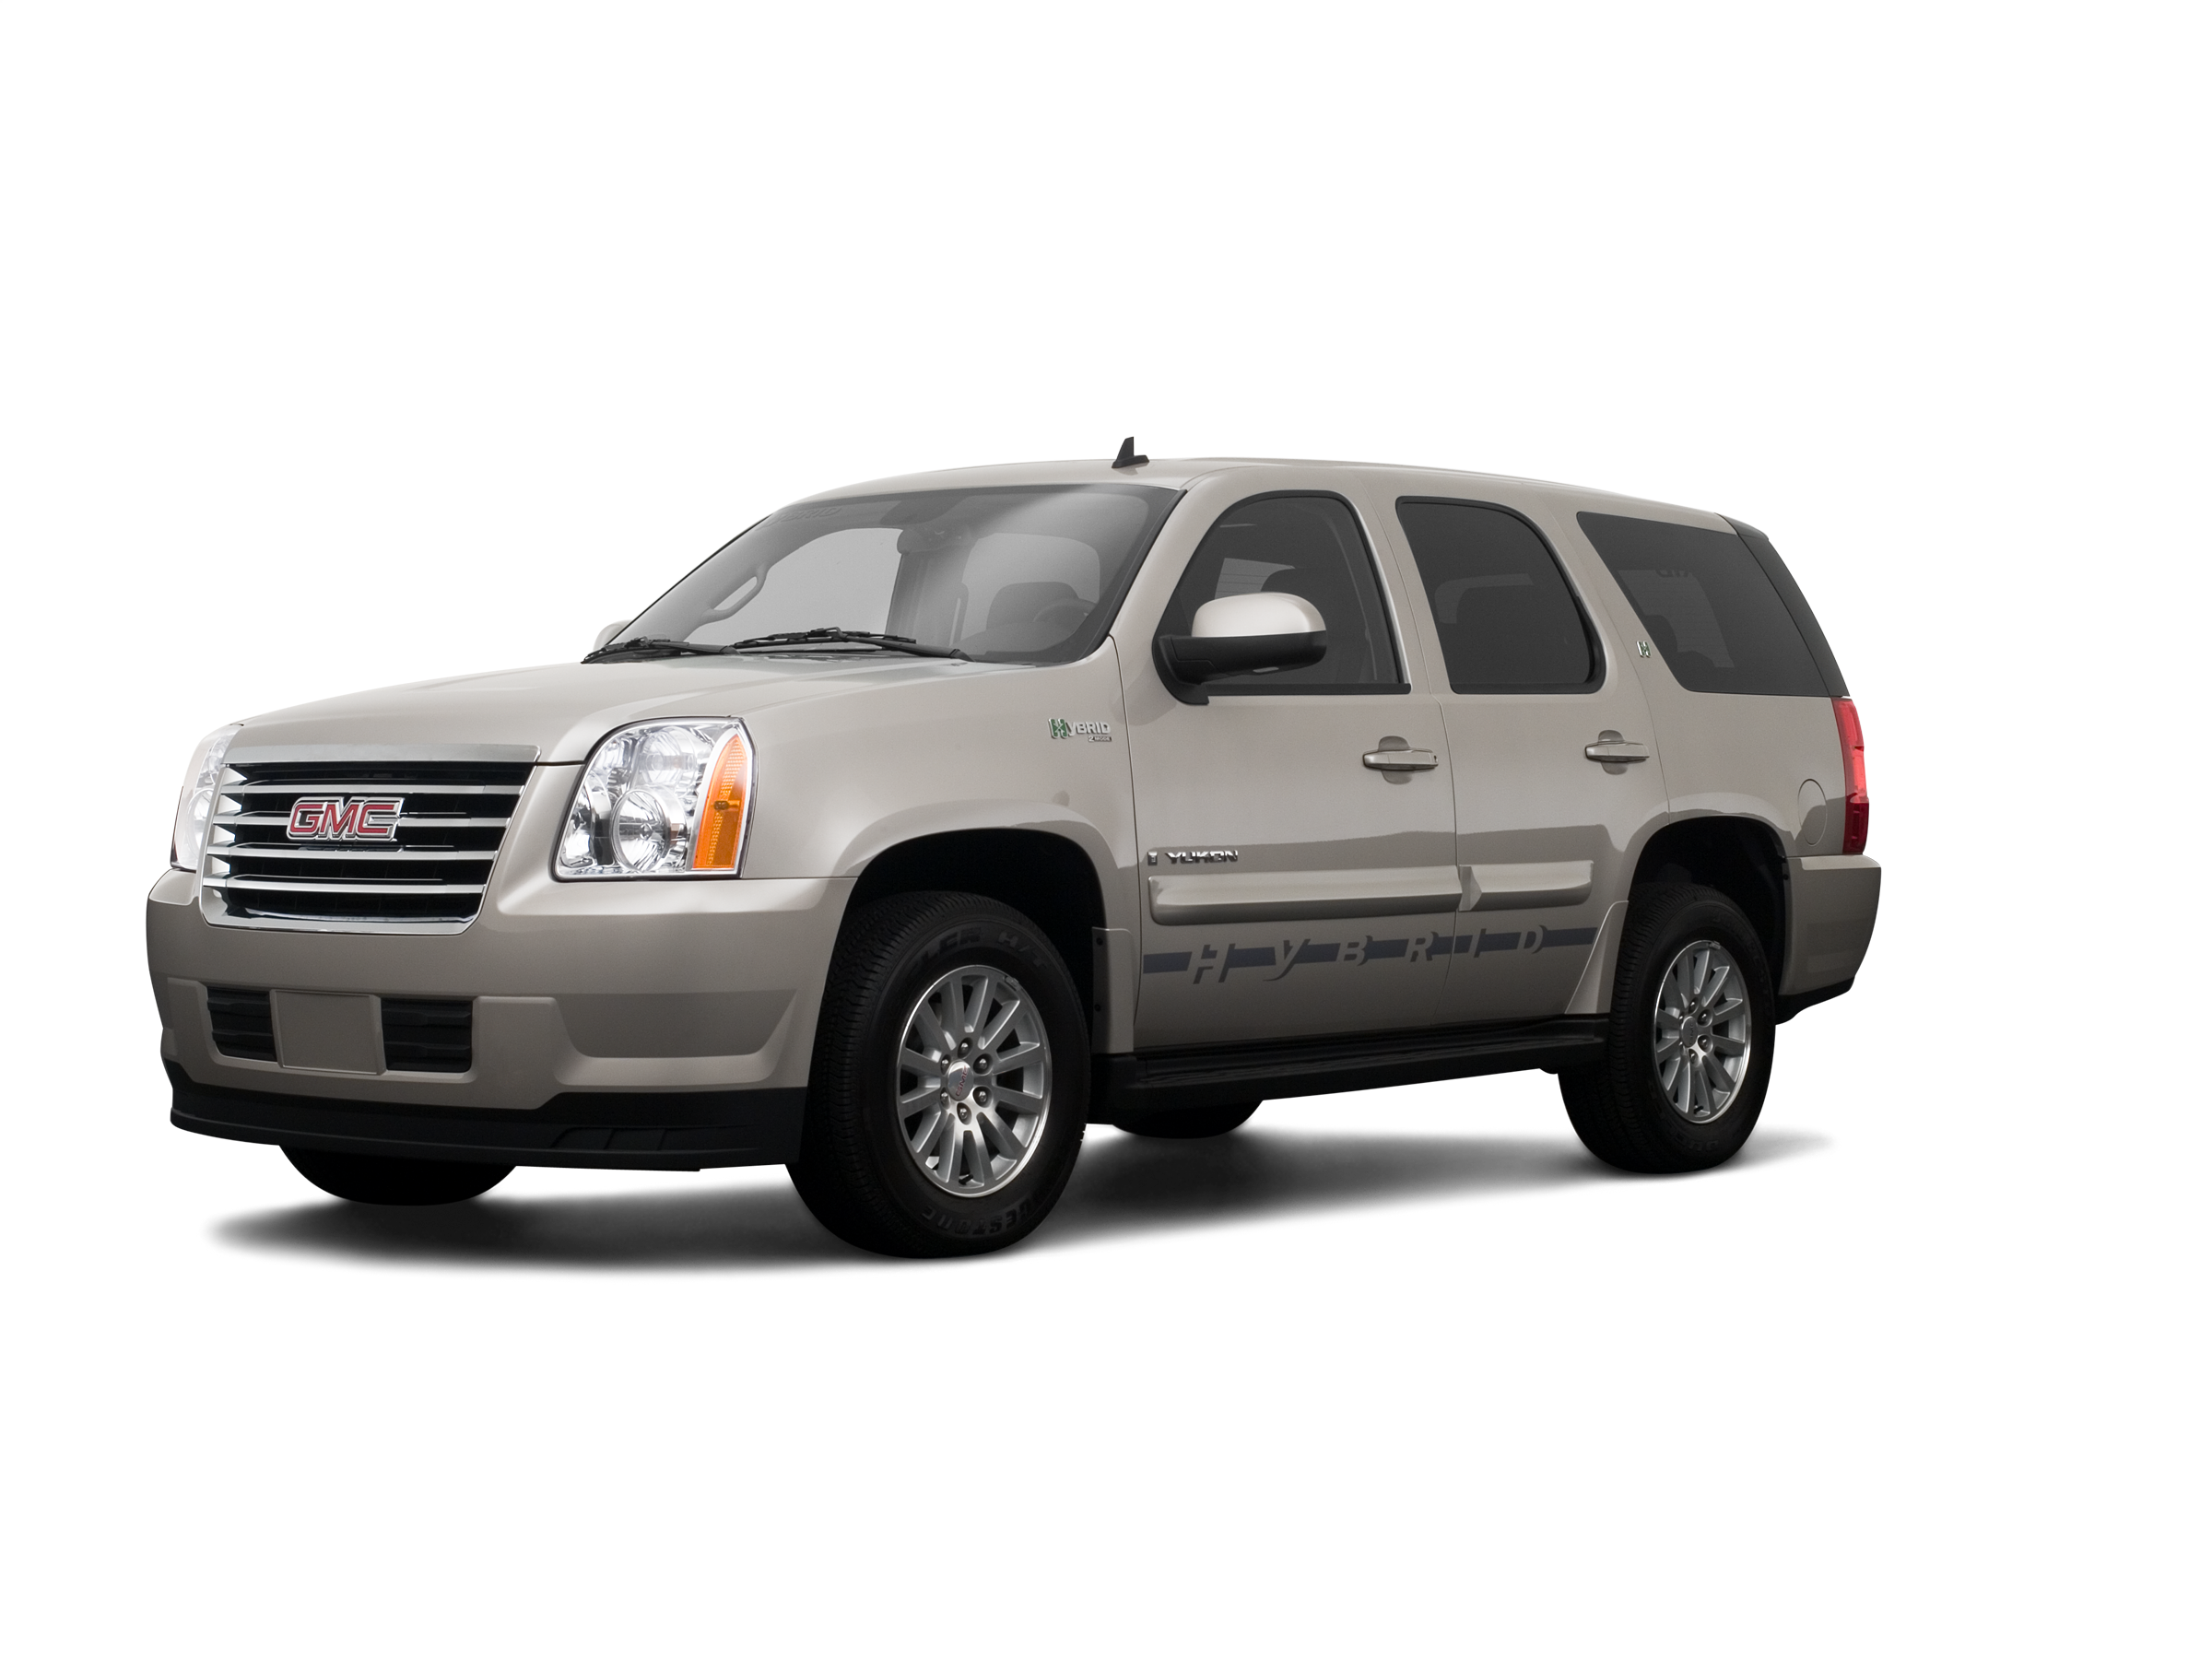 2008 Gmc Yukon Values Cars For Sale Kelley Blue Book